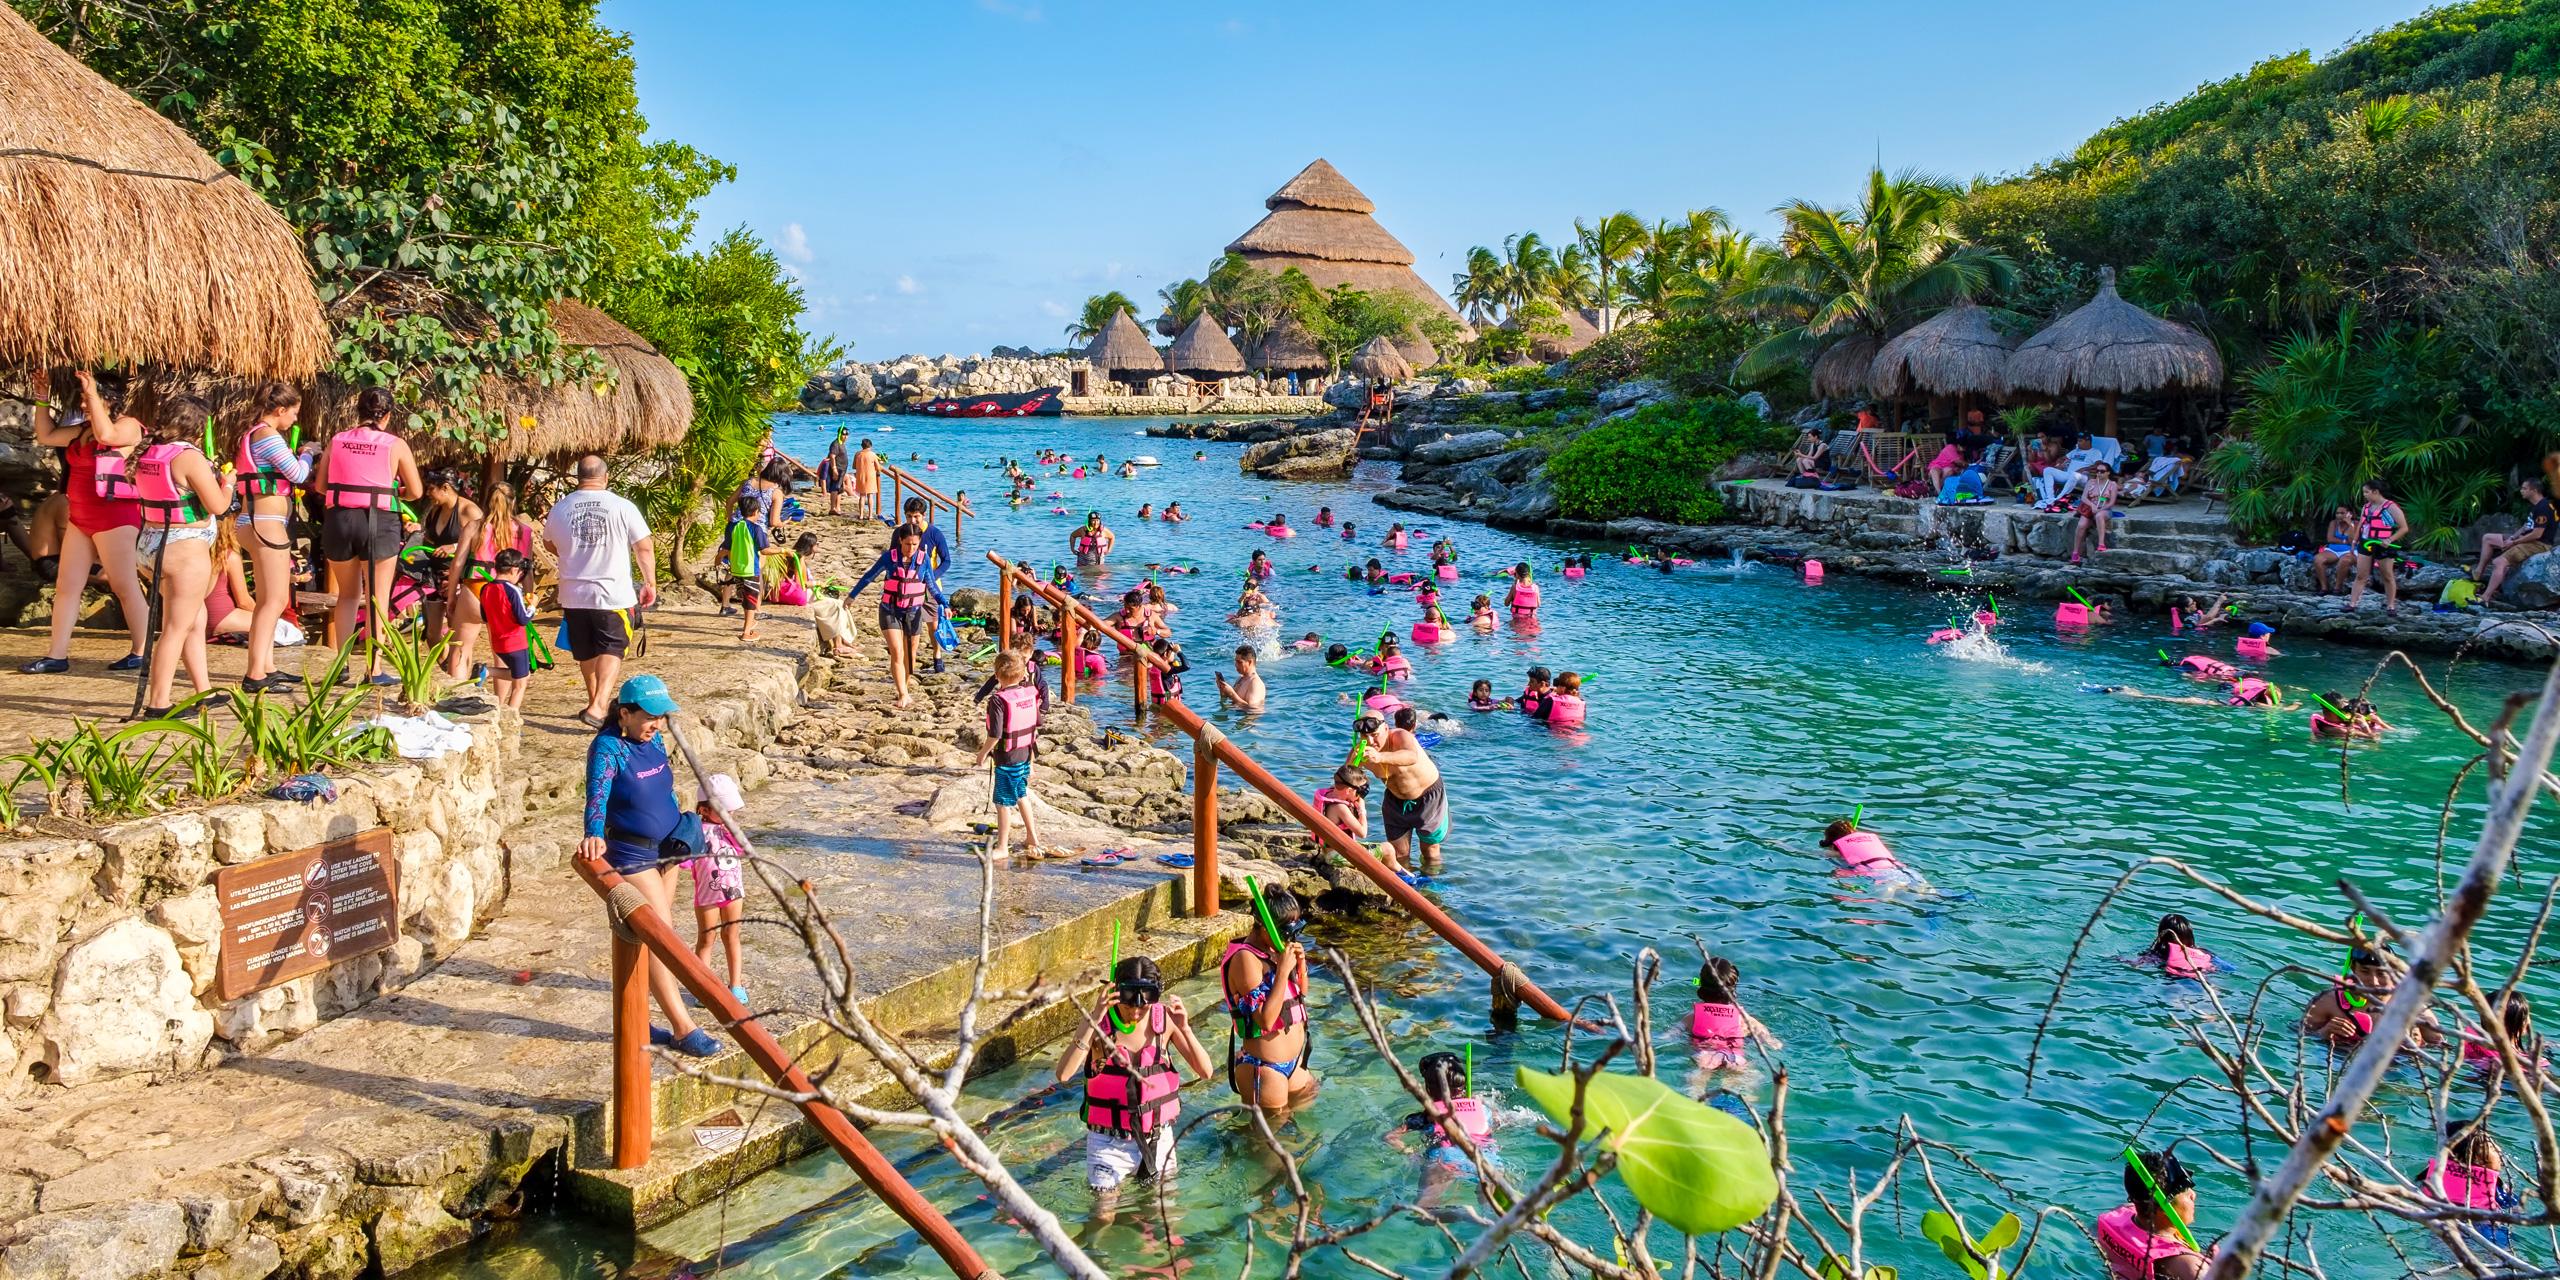 Snorkeling at XCaret park on the Mayan Riviera; Courtesy Kamira/Shutterstock